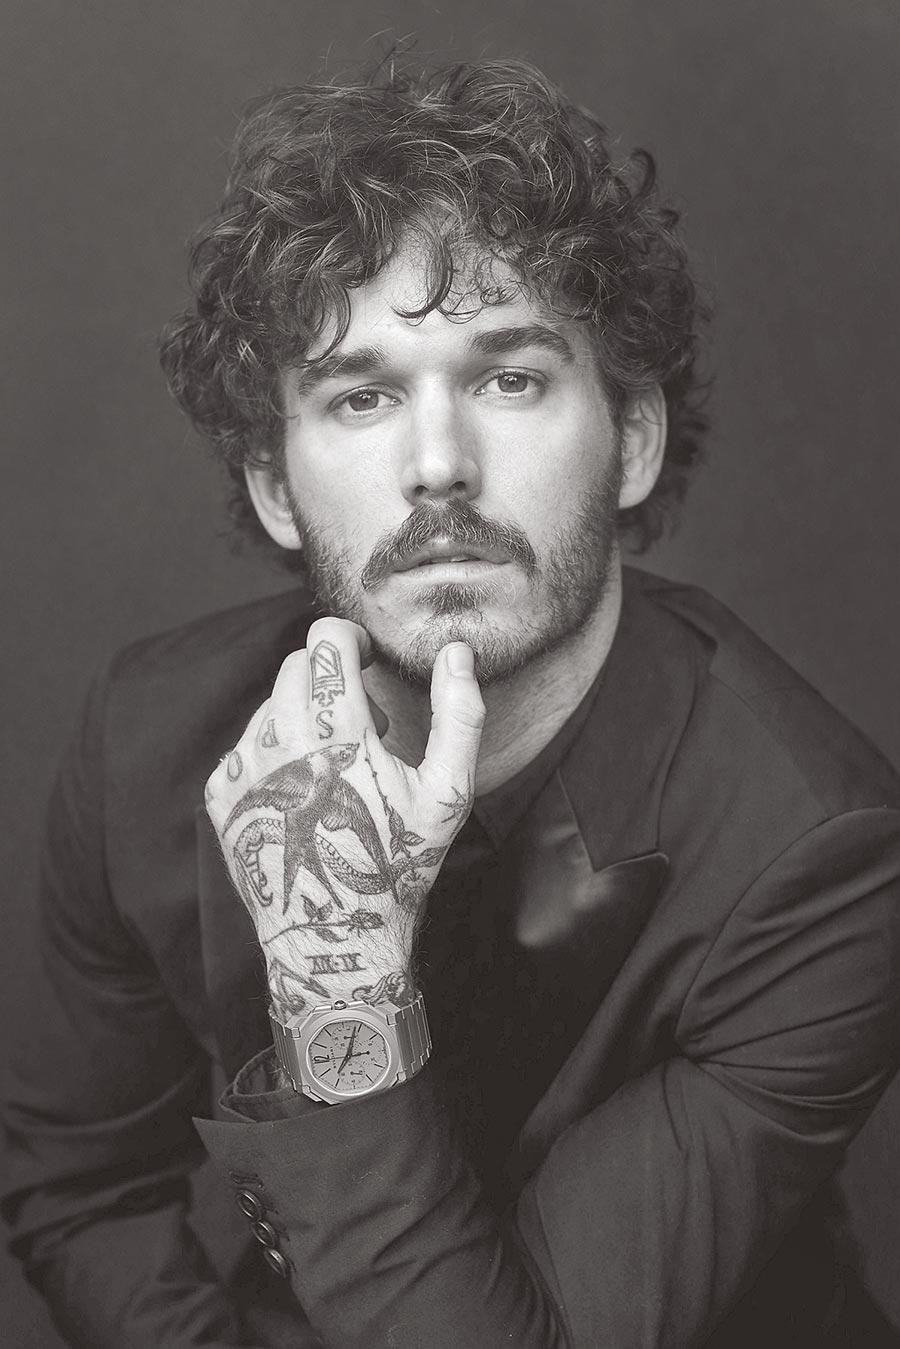 藝術家David Alexander FLINN帥氣演繹寶格麗Octo Finissimo超薄計時GMT自動上鍊腕表。(ARNALDO ANAYA LUCA提供)